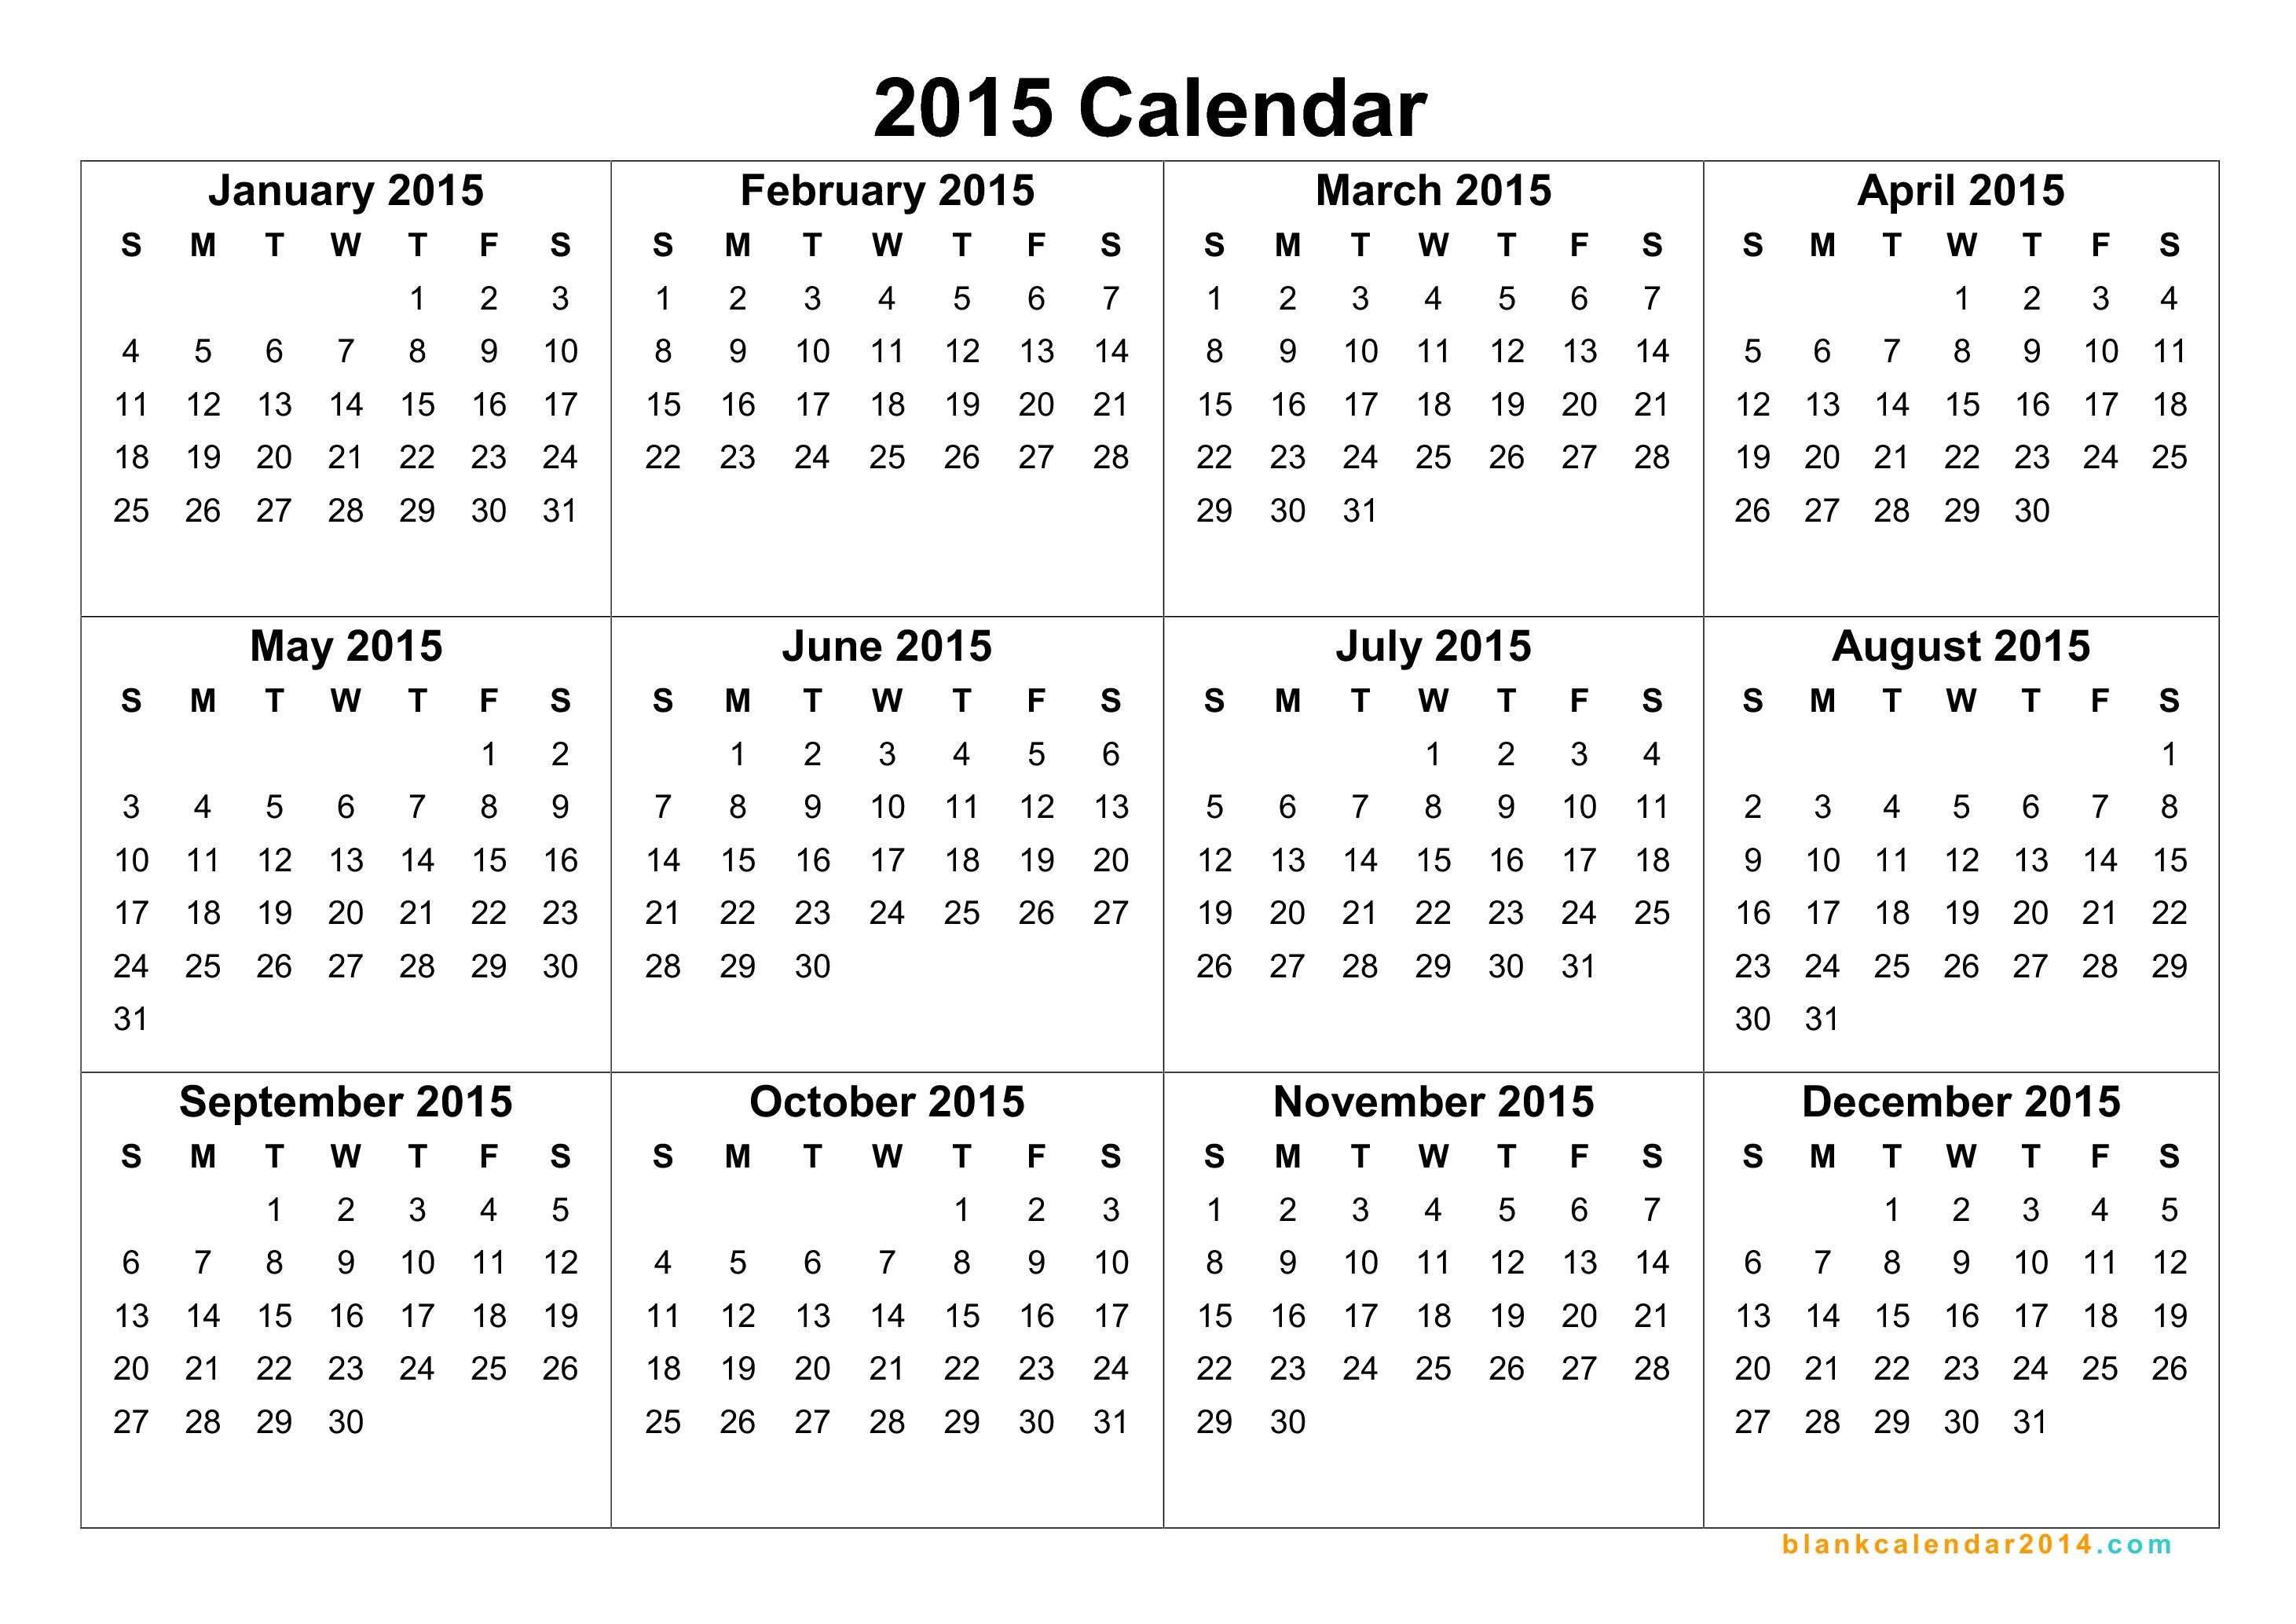 Blank Calendar 2015 - Wpa.wpart.co